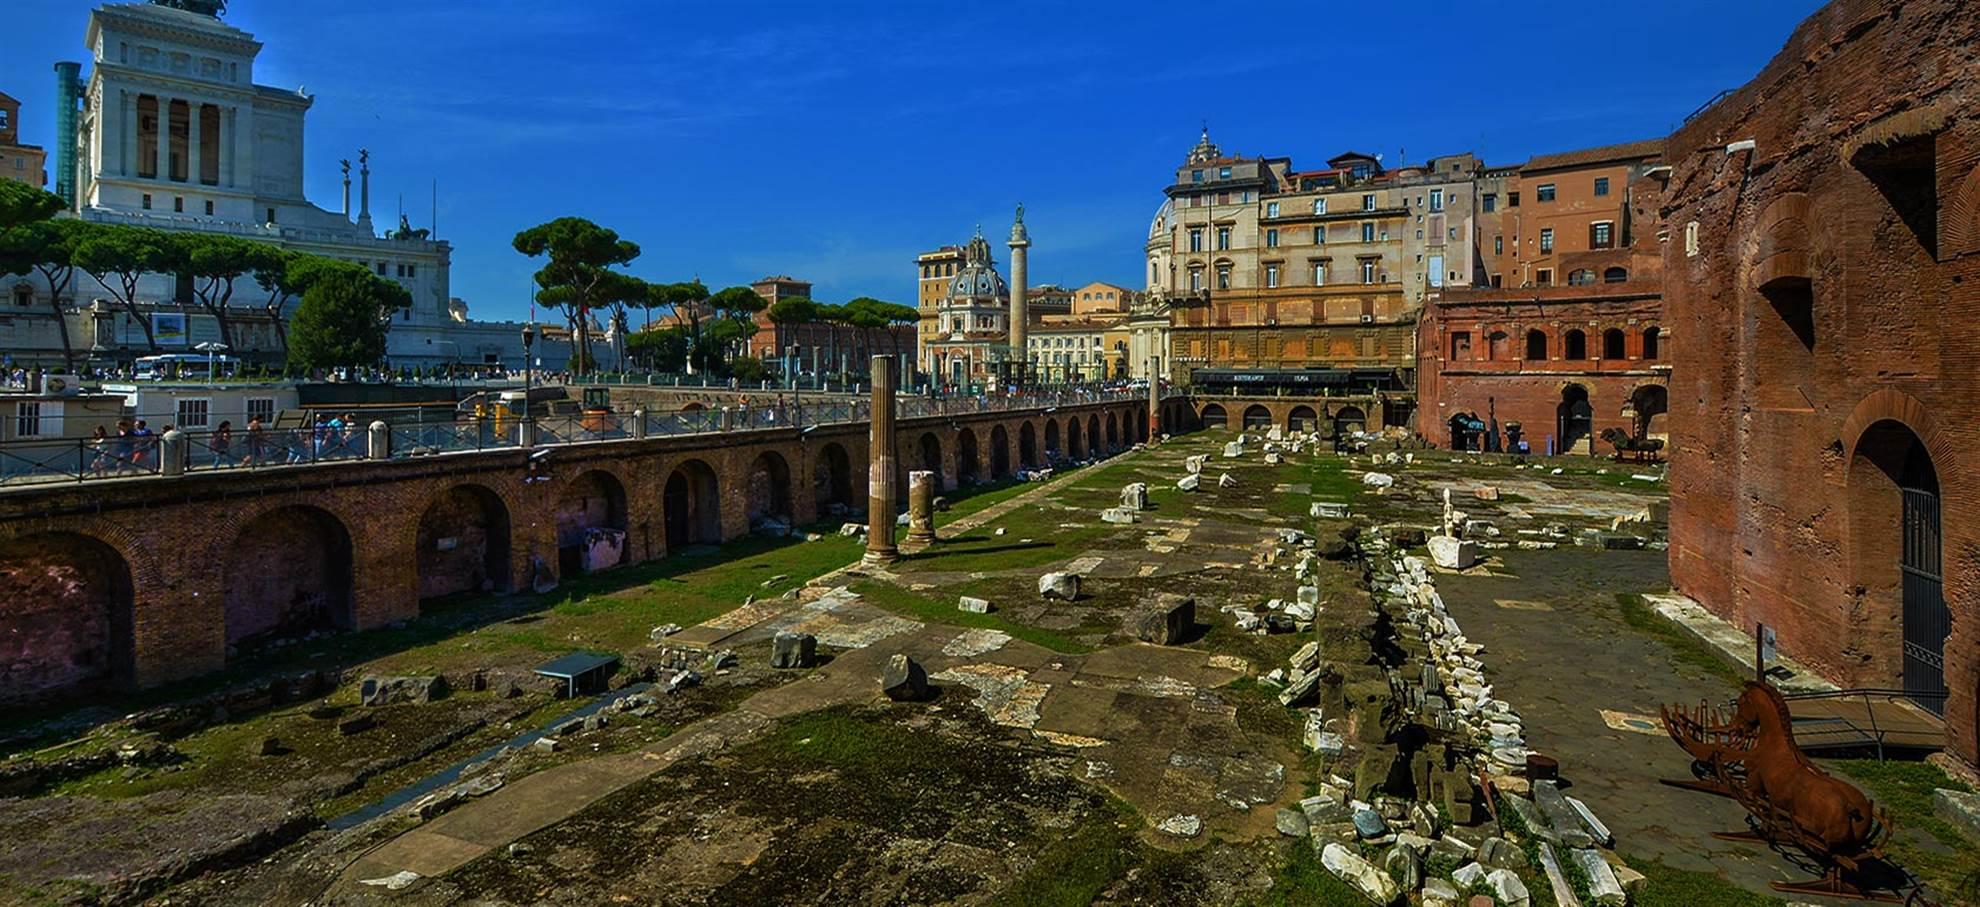 Форум Цезаря и Августа